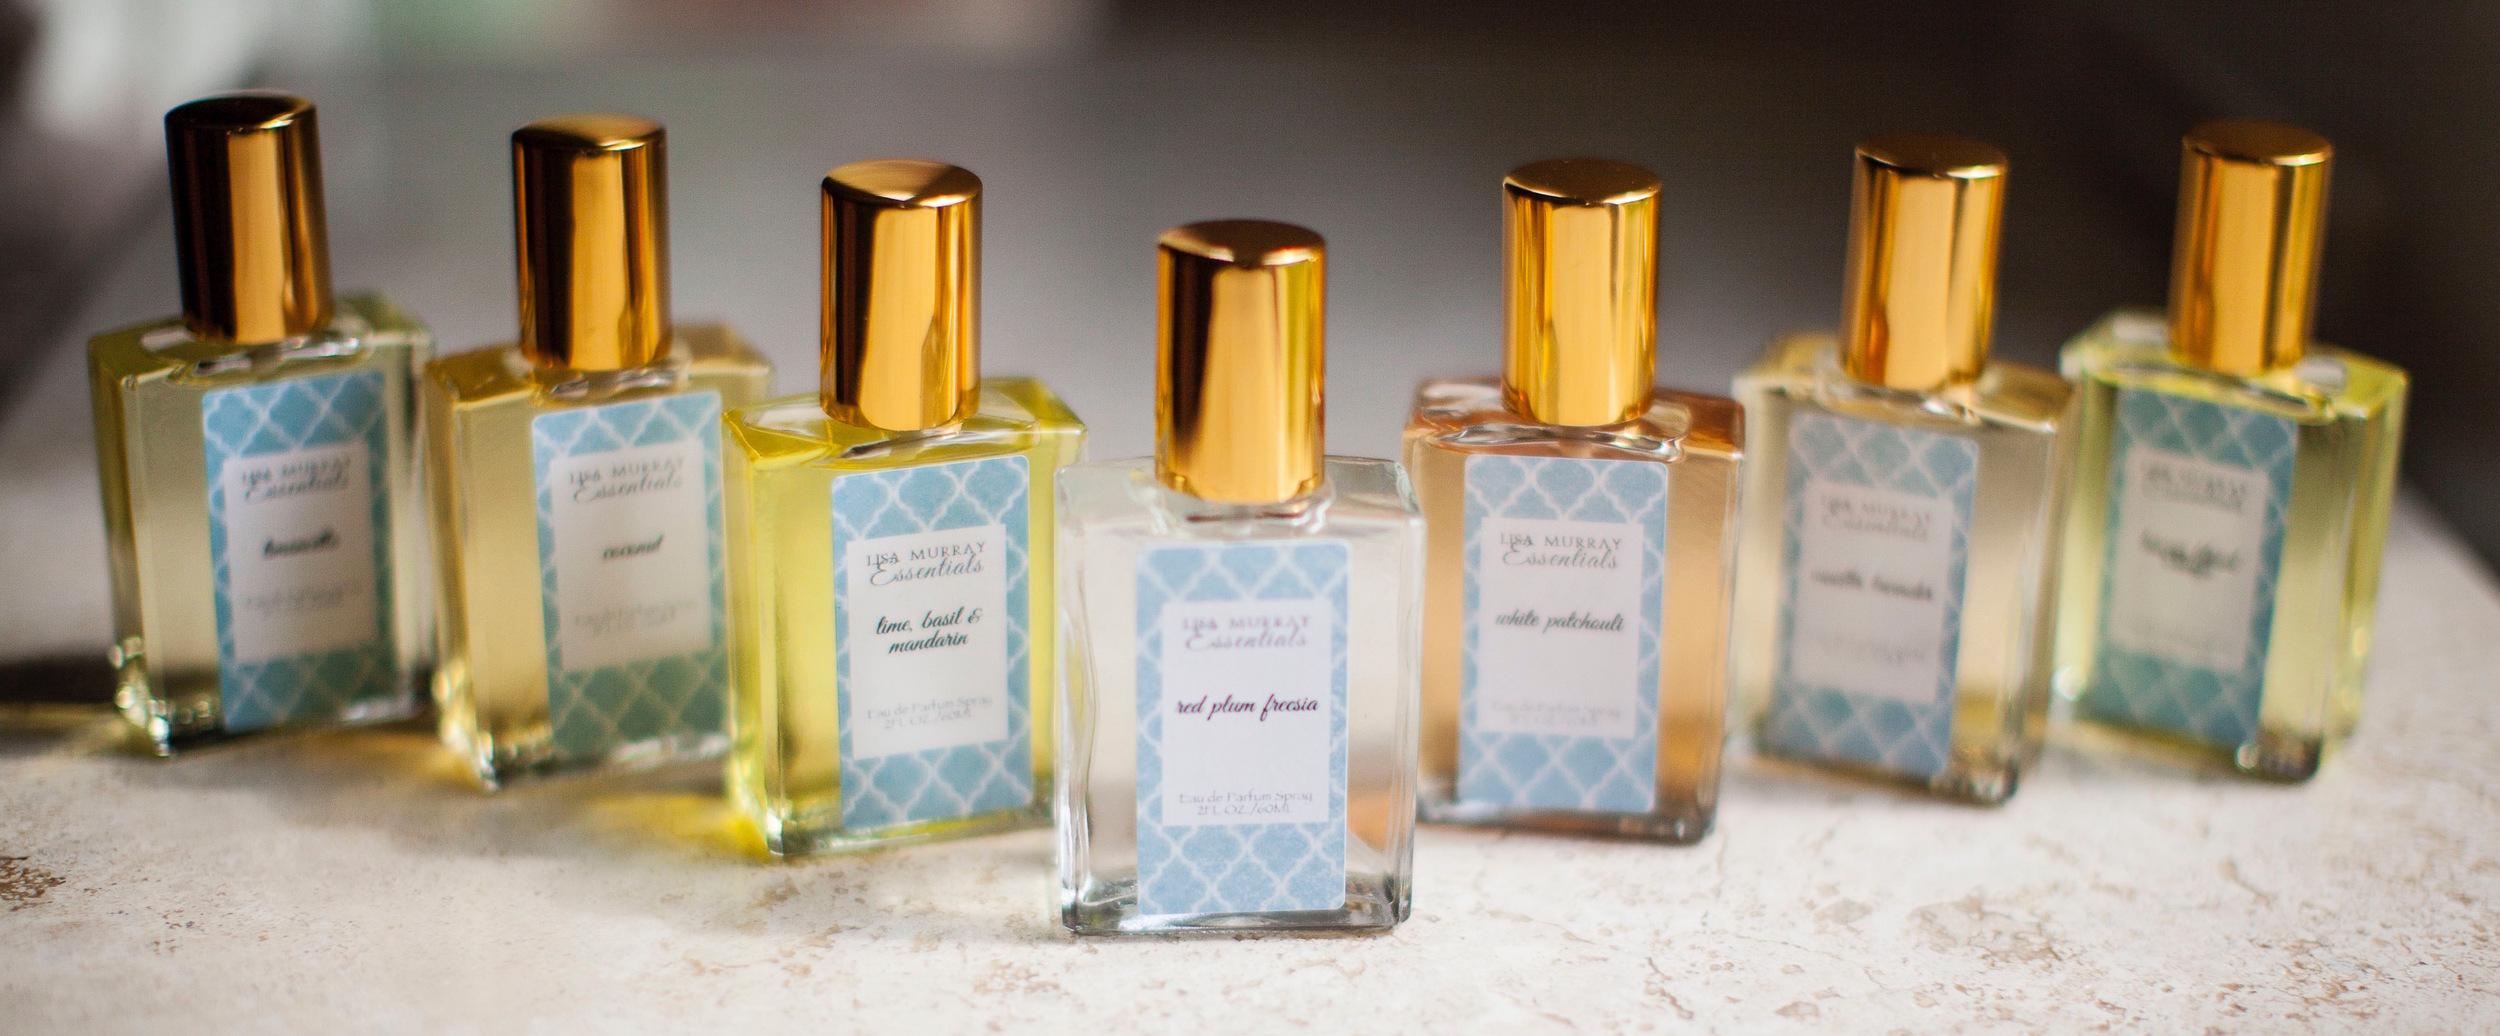 Sargent_perfume_-5451.jpg